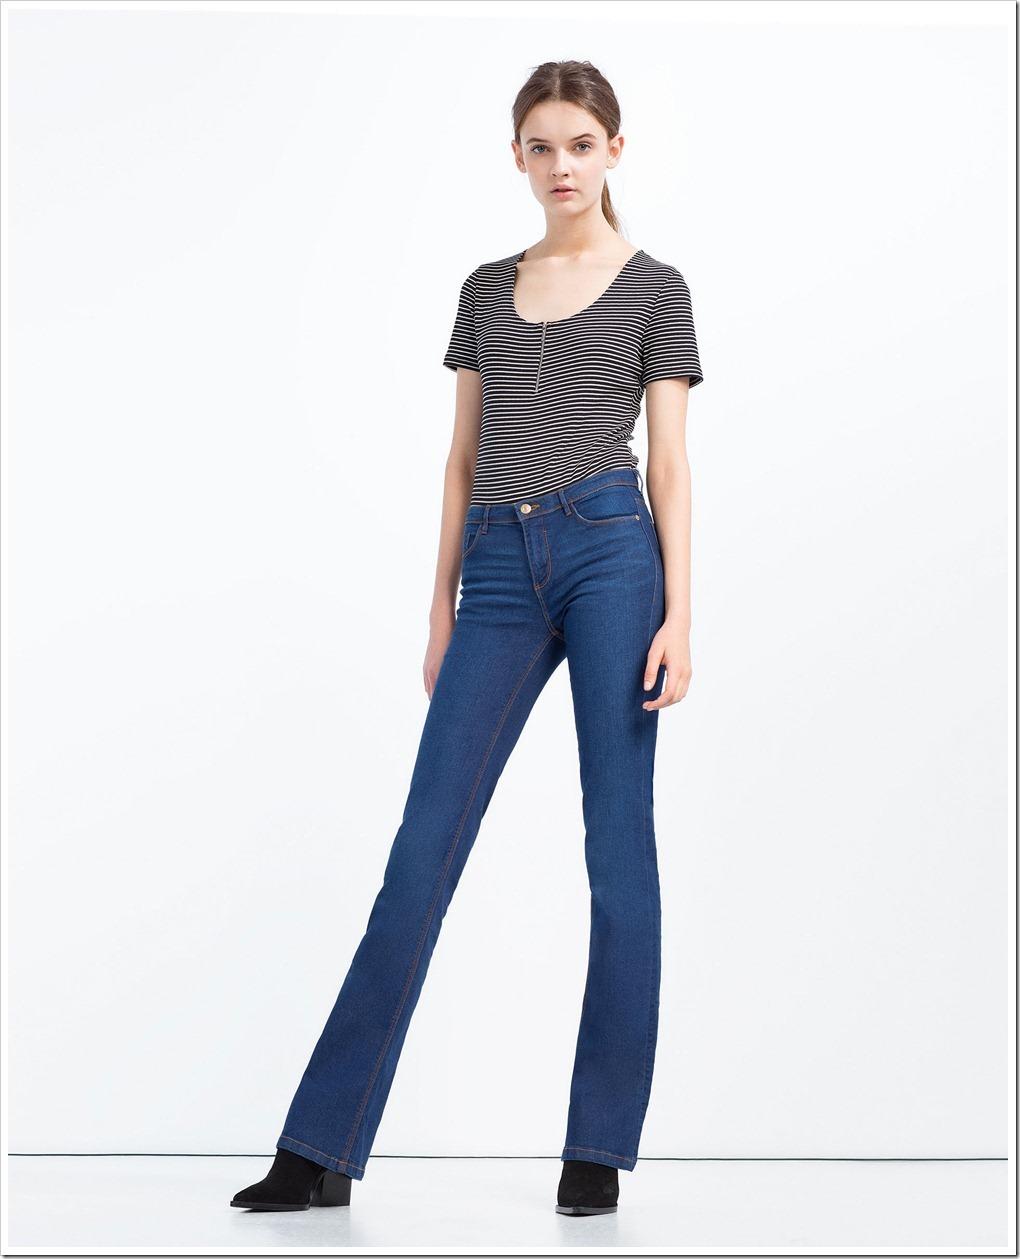 SS16 Denim styles from Zara : Zara Collection - Denim ...